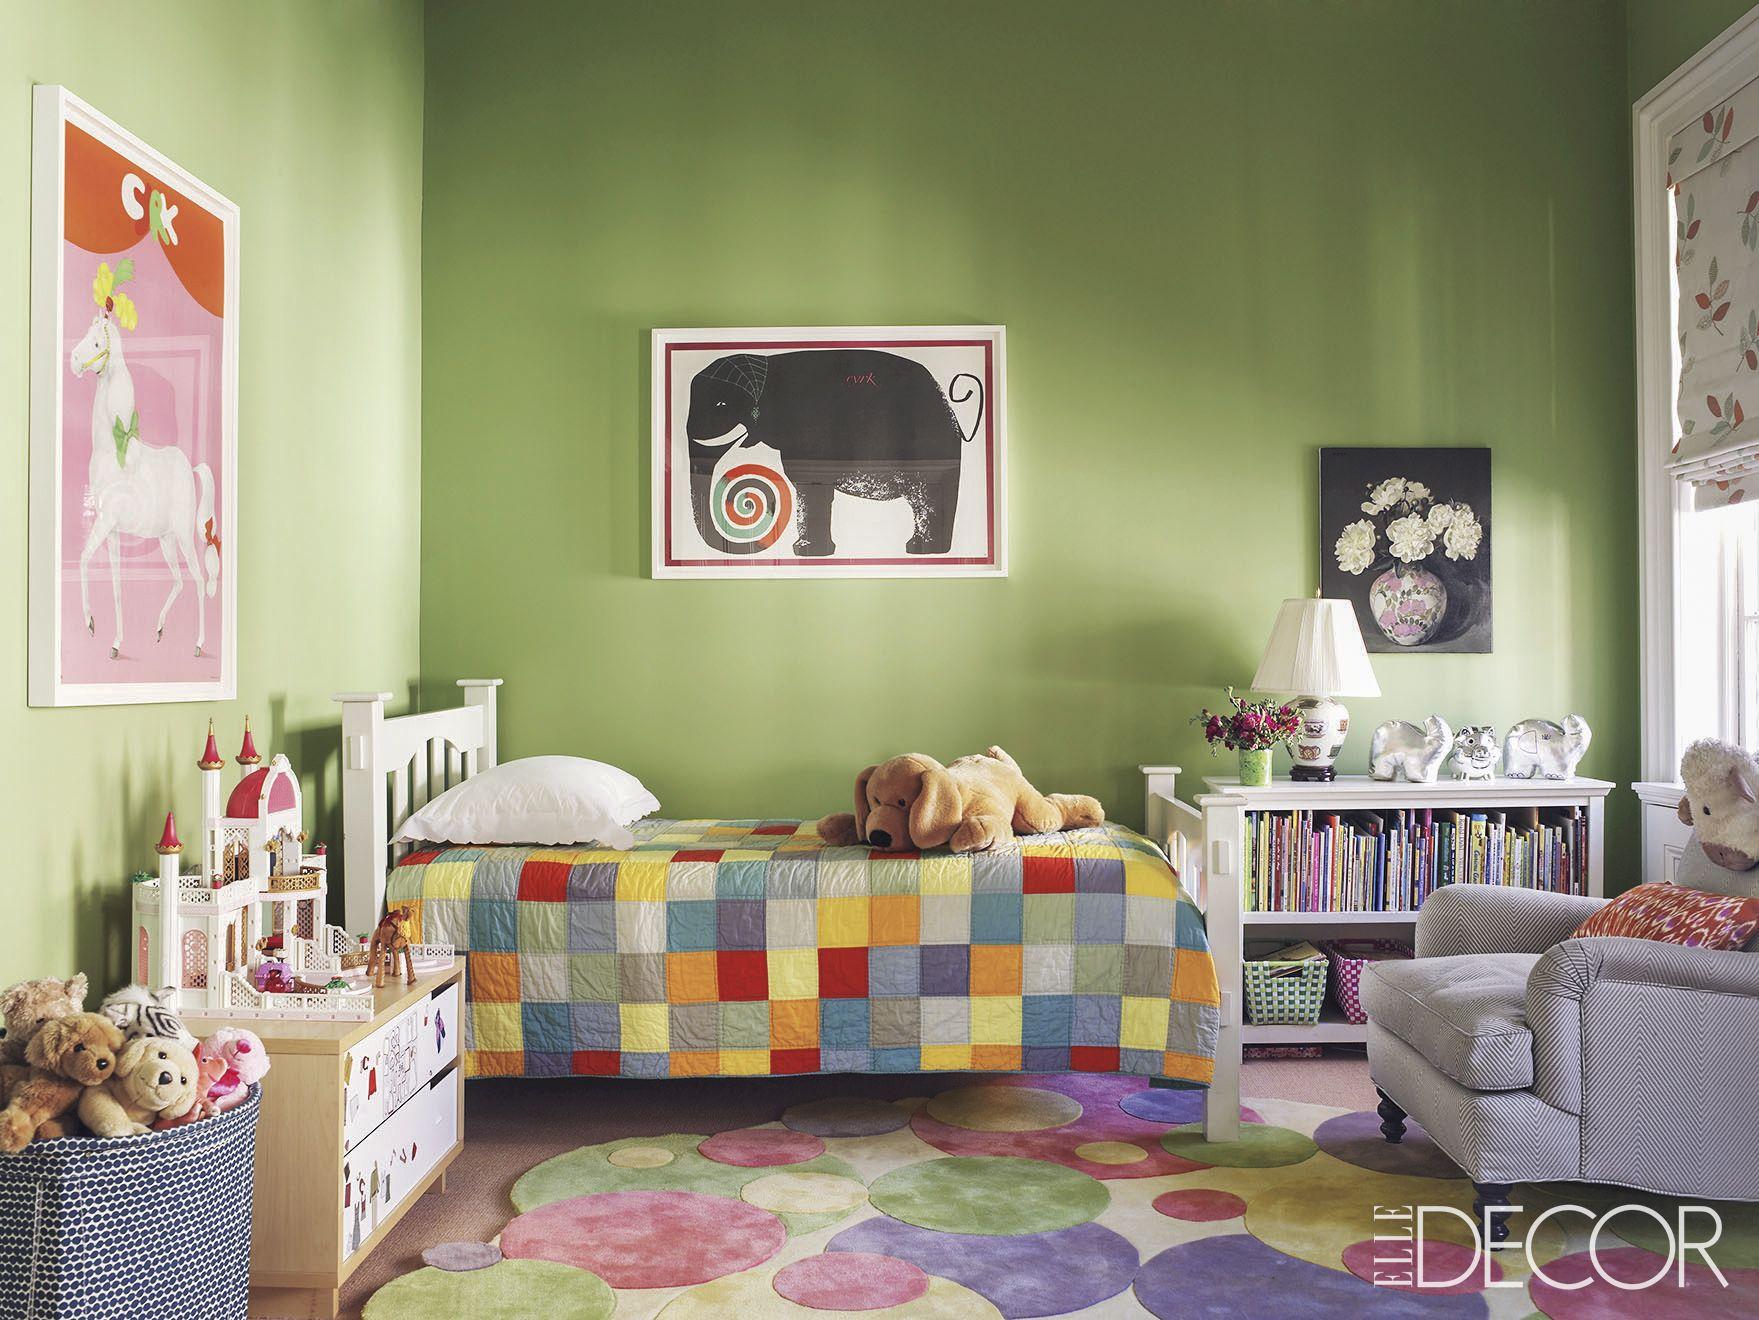 18 cool kids room decorating ideas kids room decor rh elledecor com decorating kids rooms decorating kids rooms